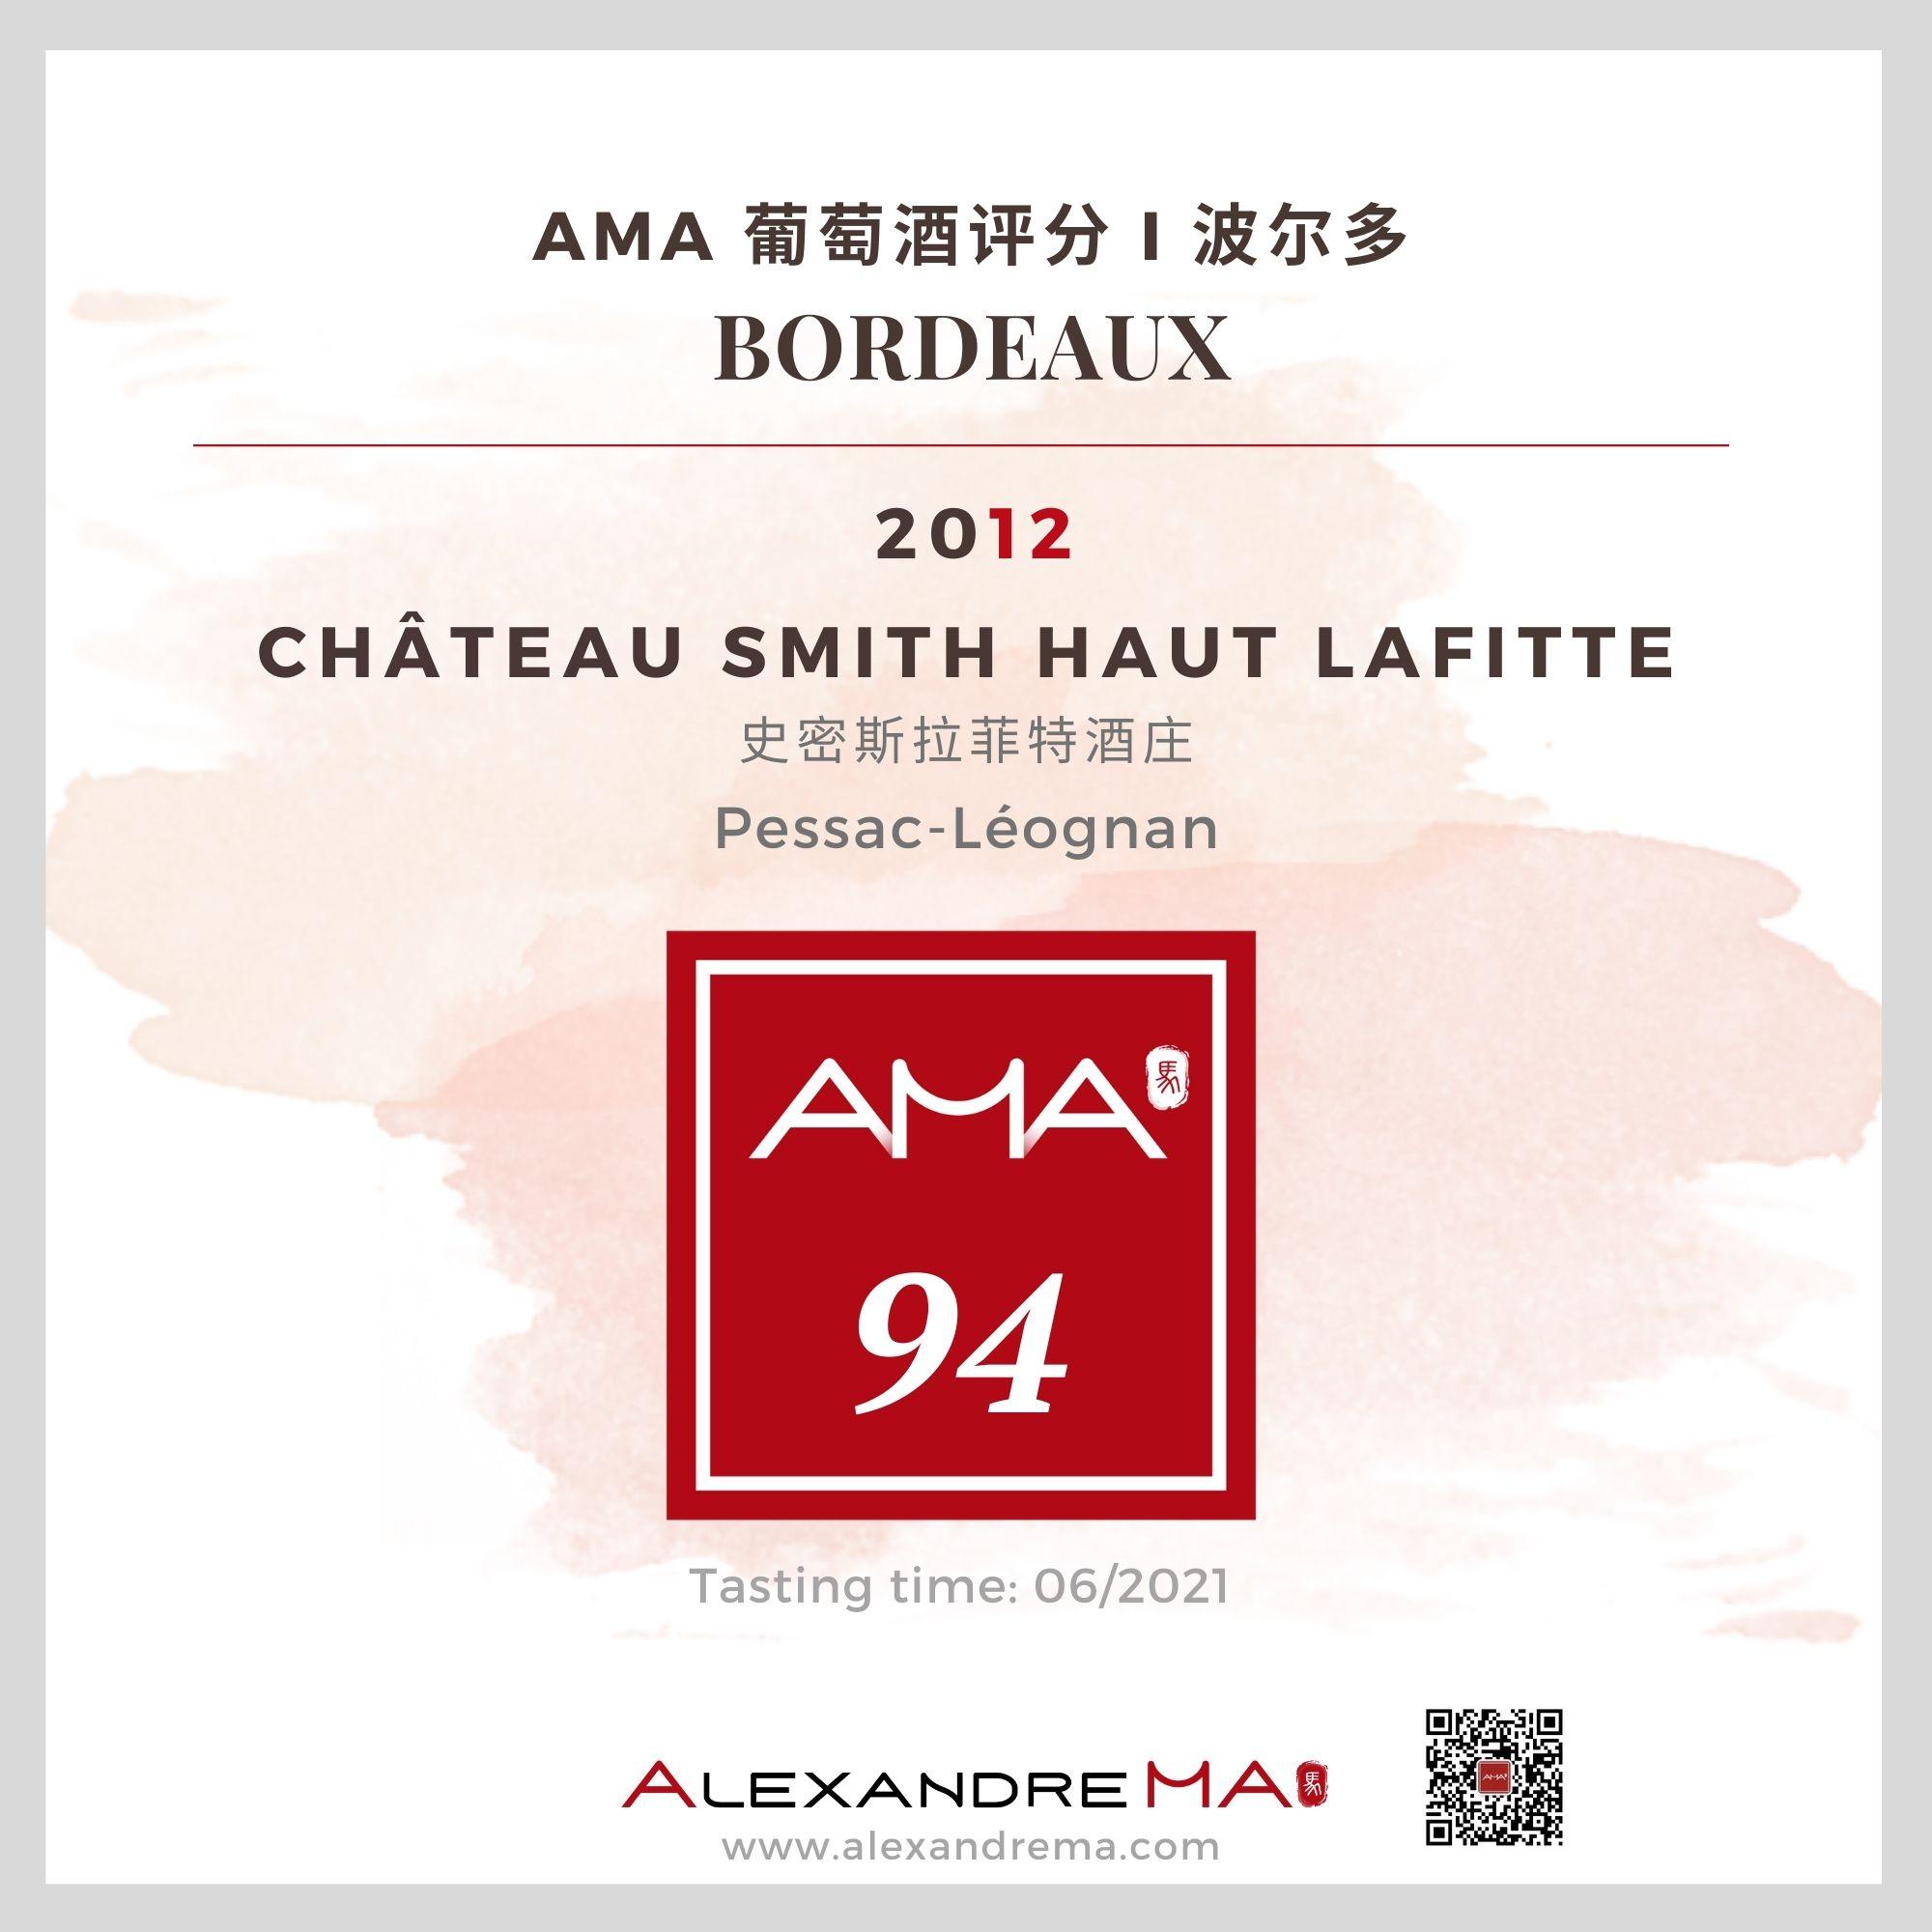 Château Smith Haut Lafitte 2012 - Alexandre MA